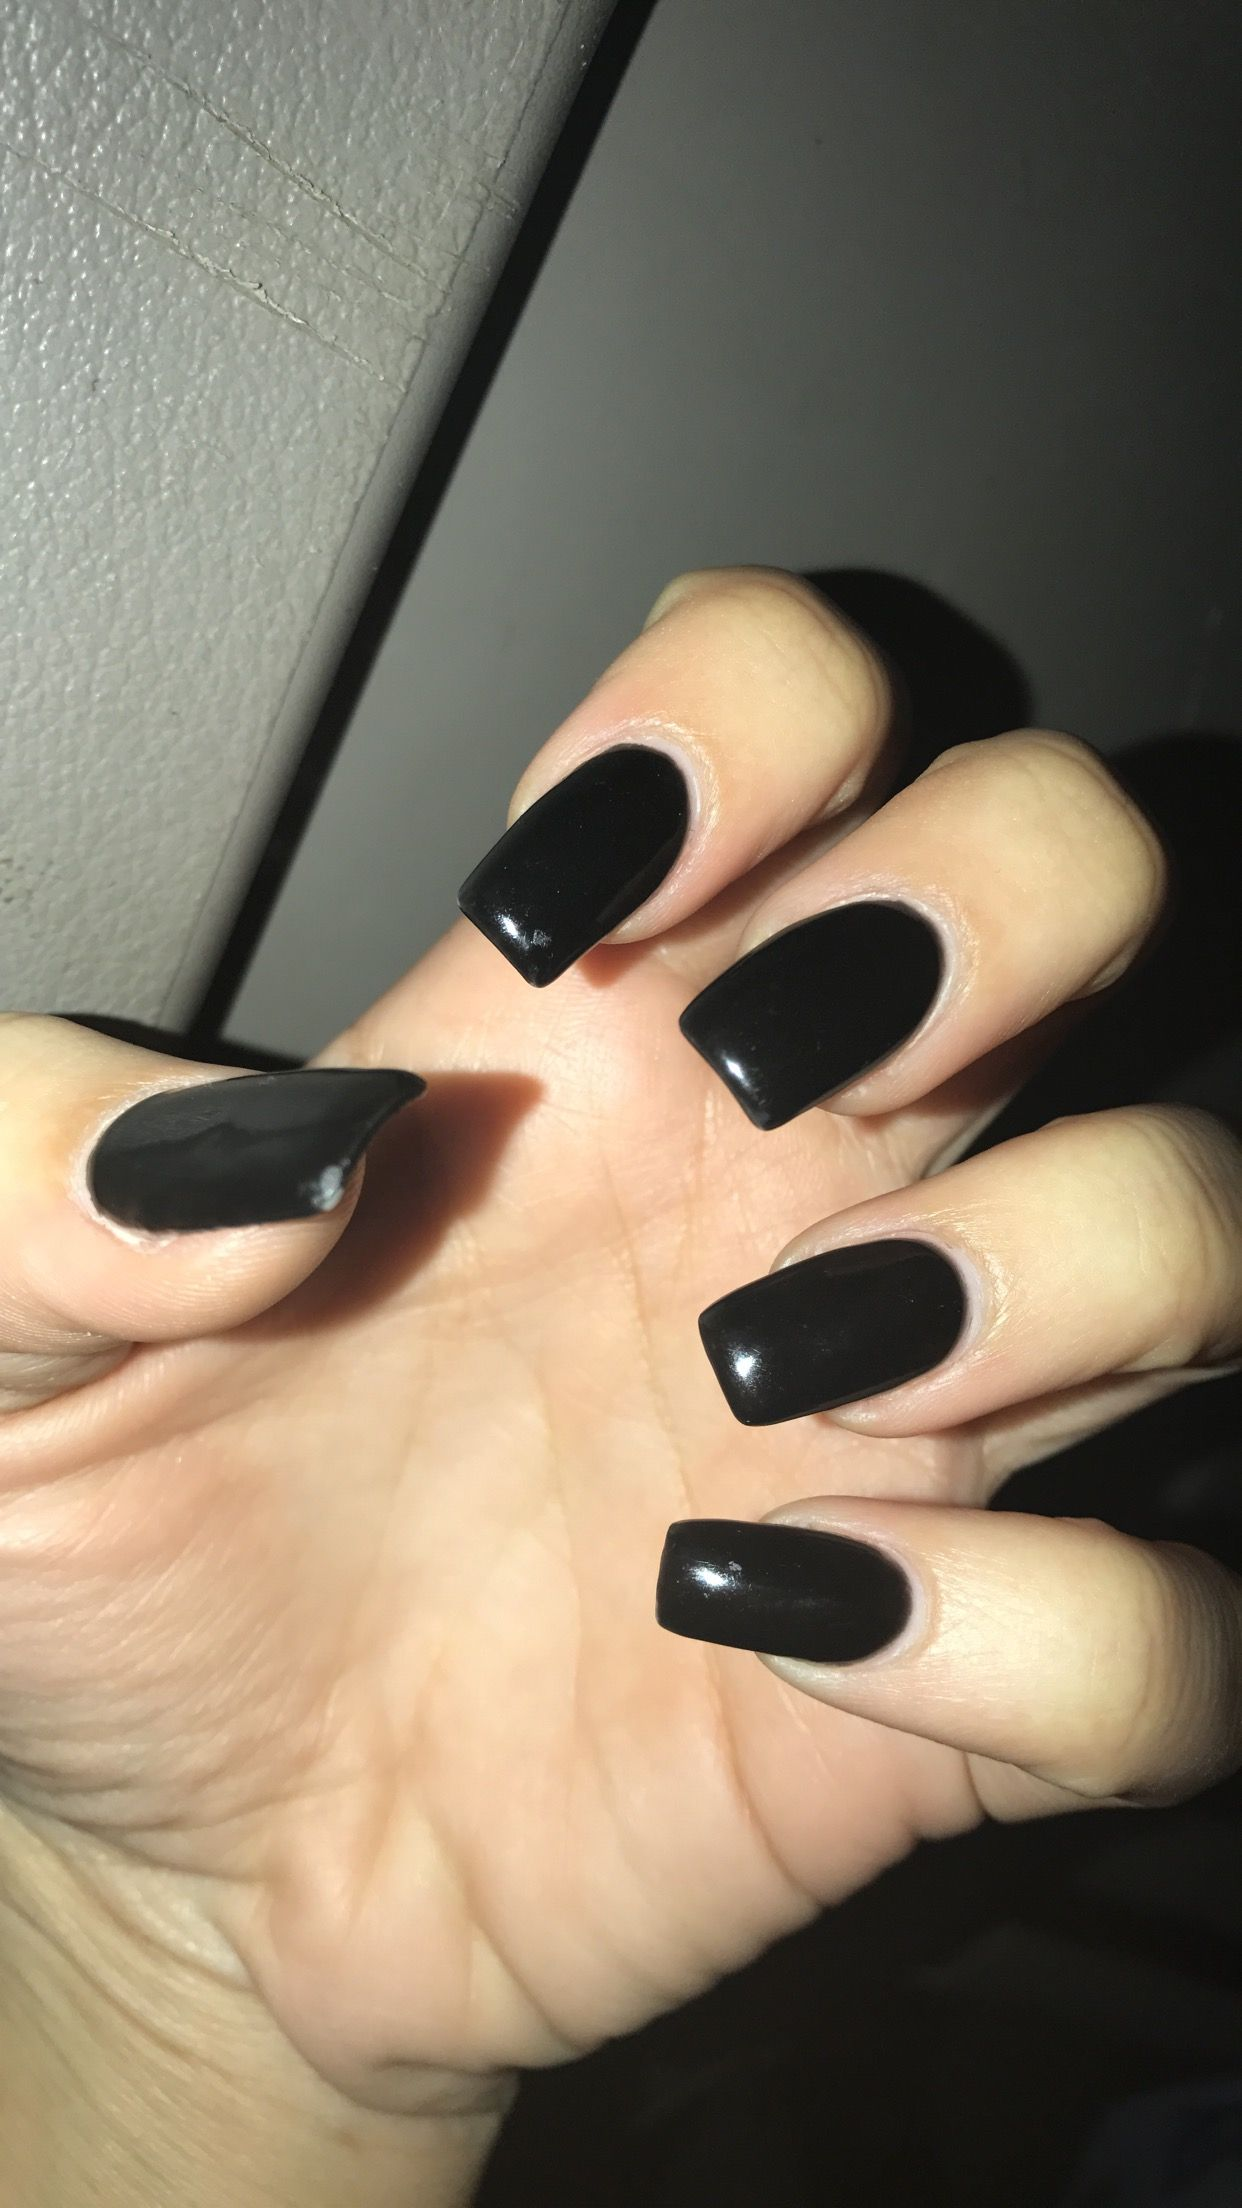 Black Long Square Nails Acrylic Black Long Nails Gel Nails Sister Tattoo Black On Black Curved Nails Long Square Nails Square Acrylic Nails